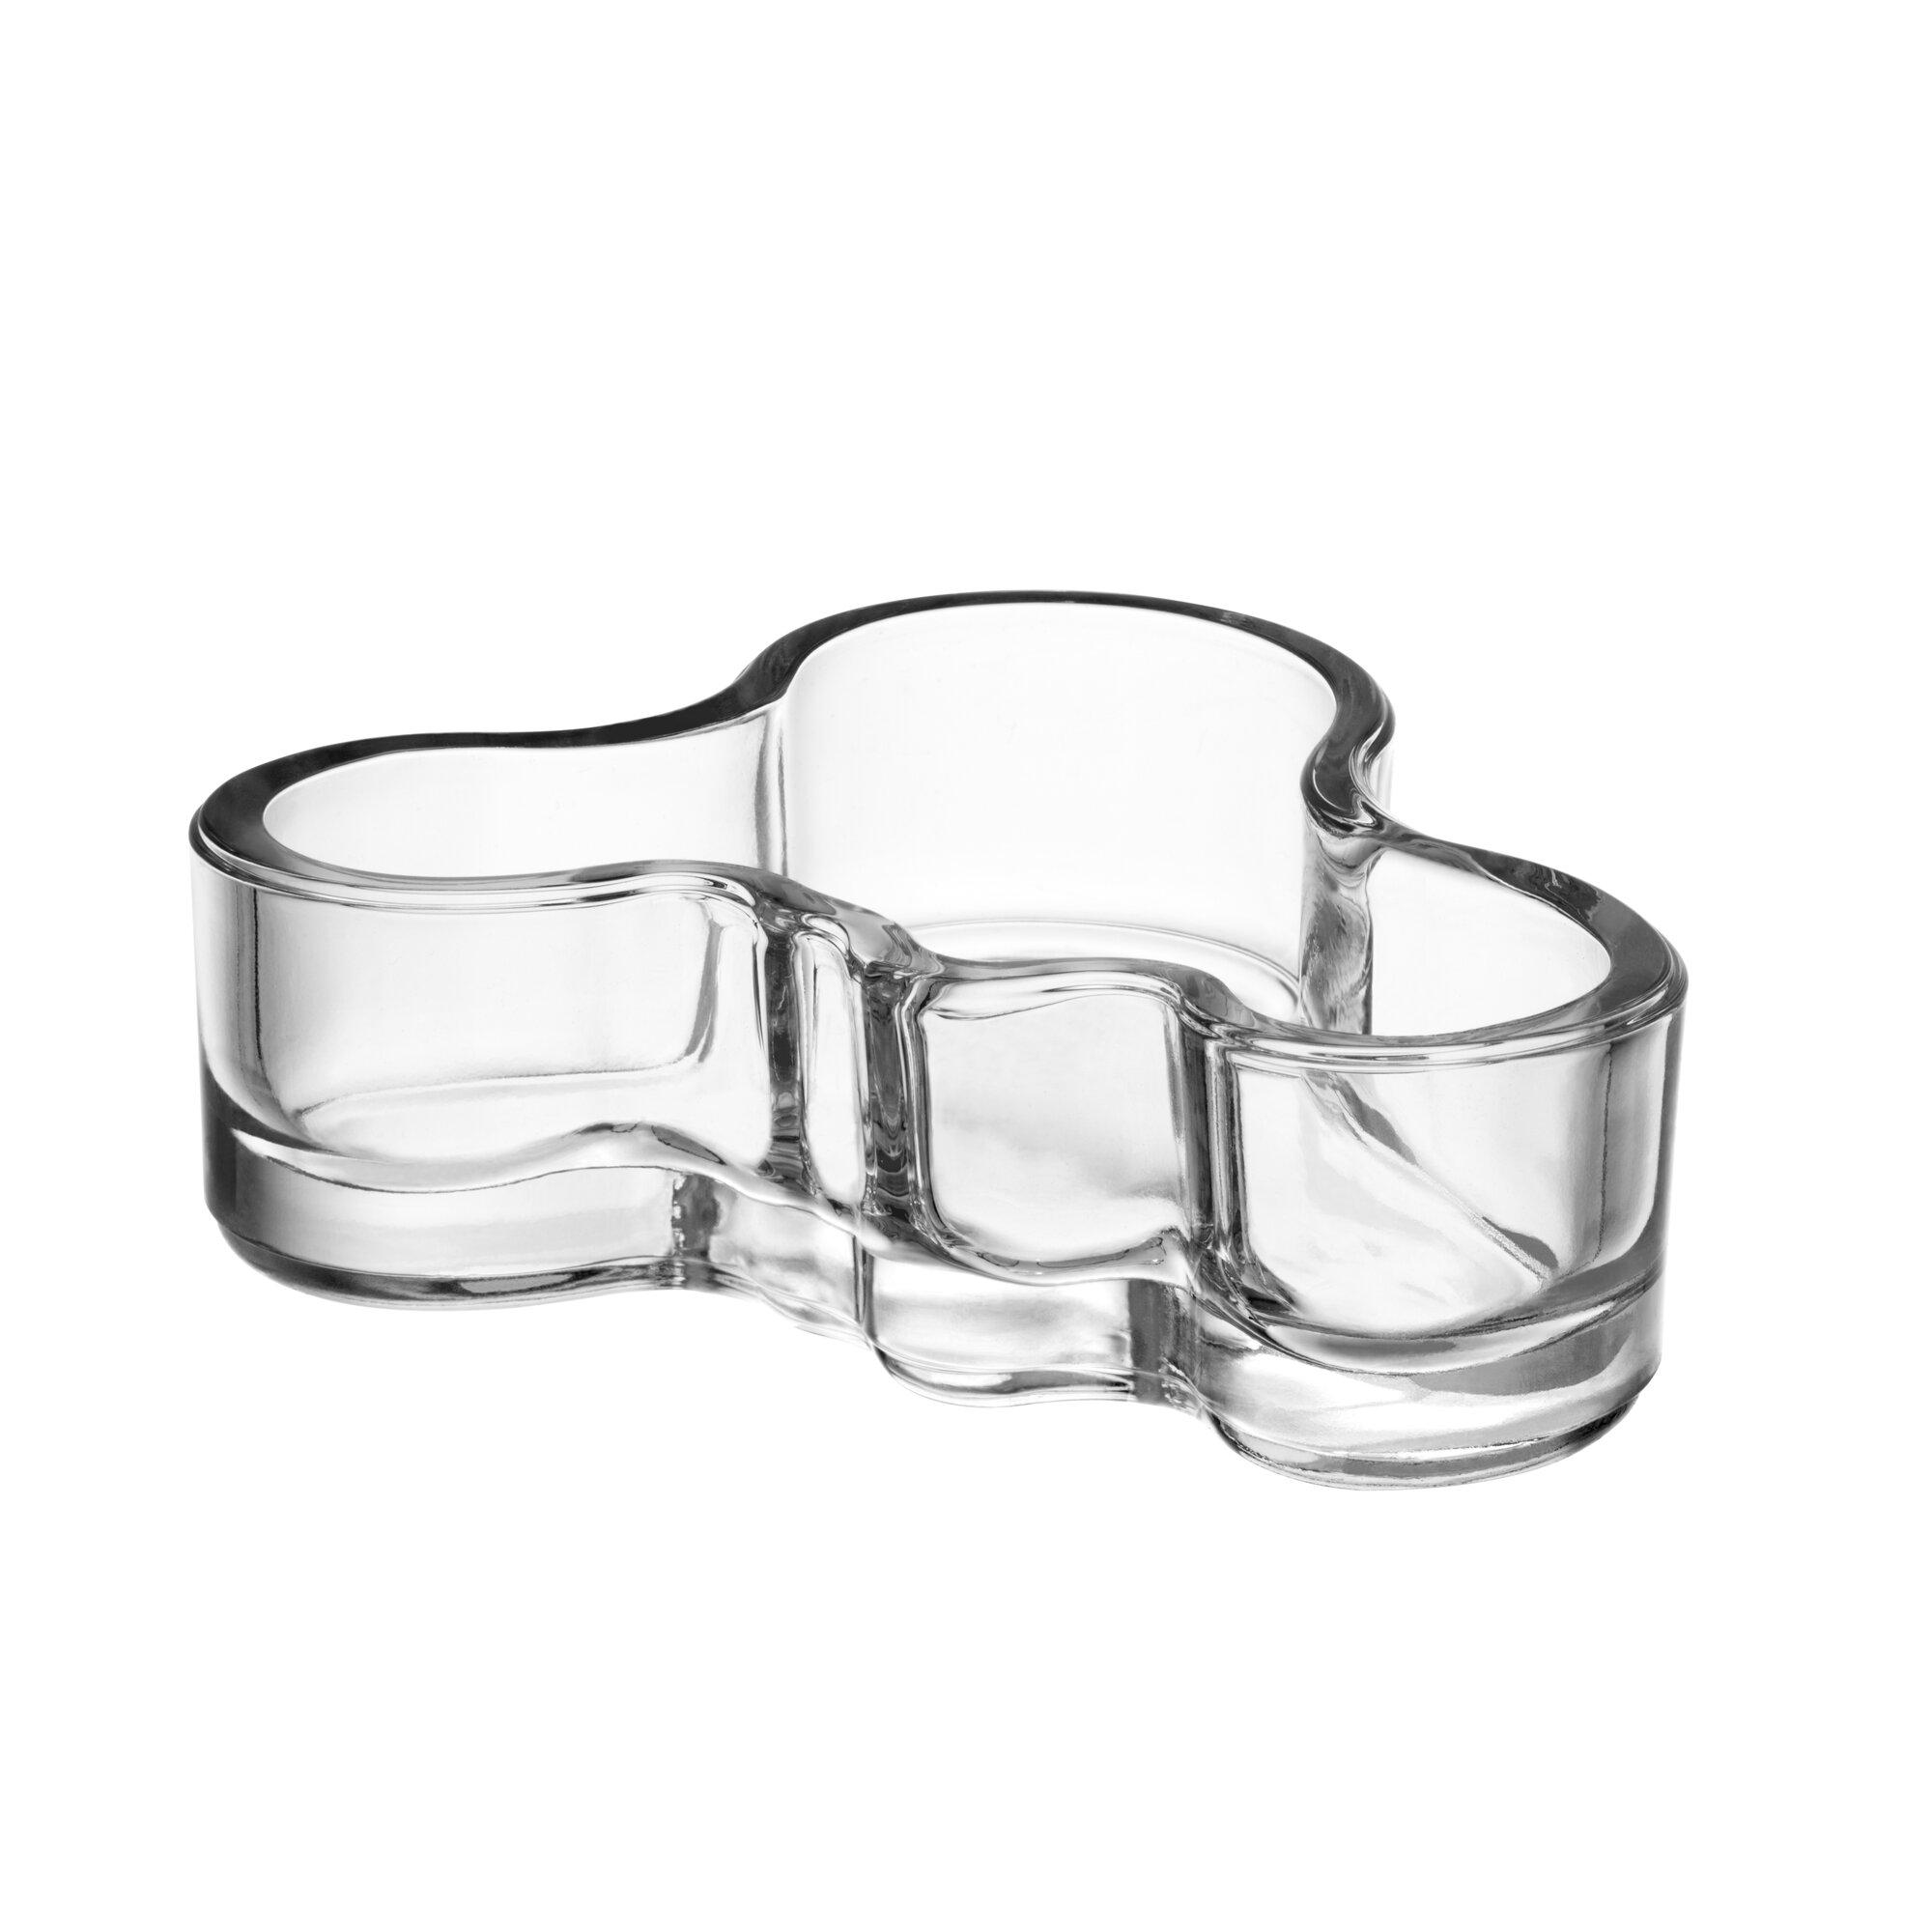 aalto mini decorative bowl - Decorative Bowl